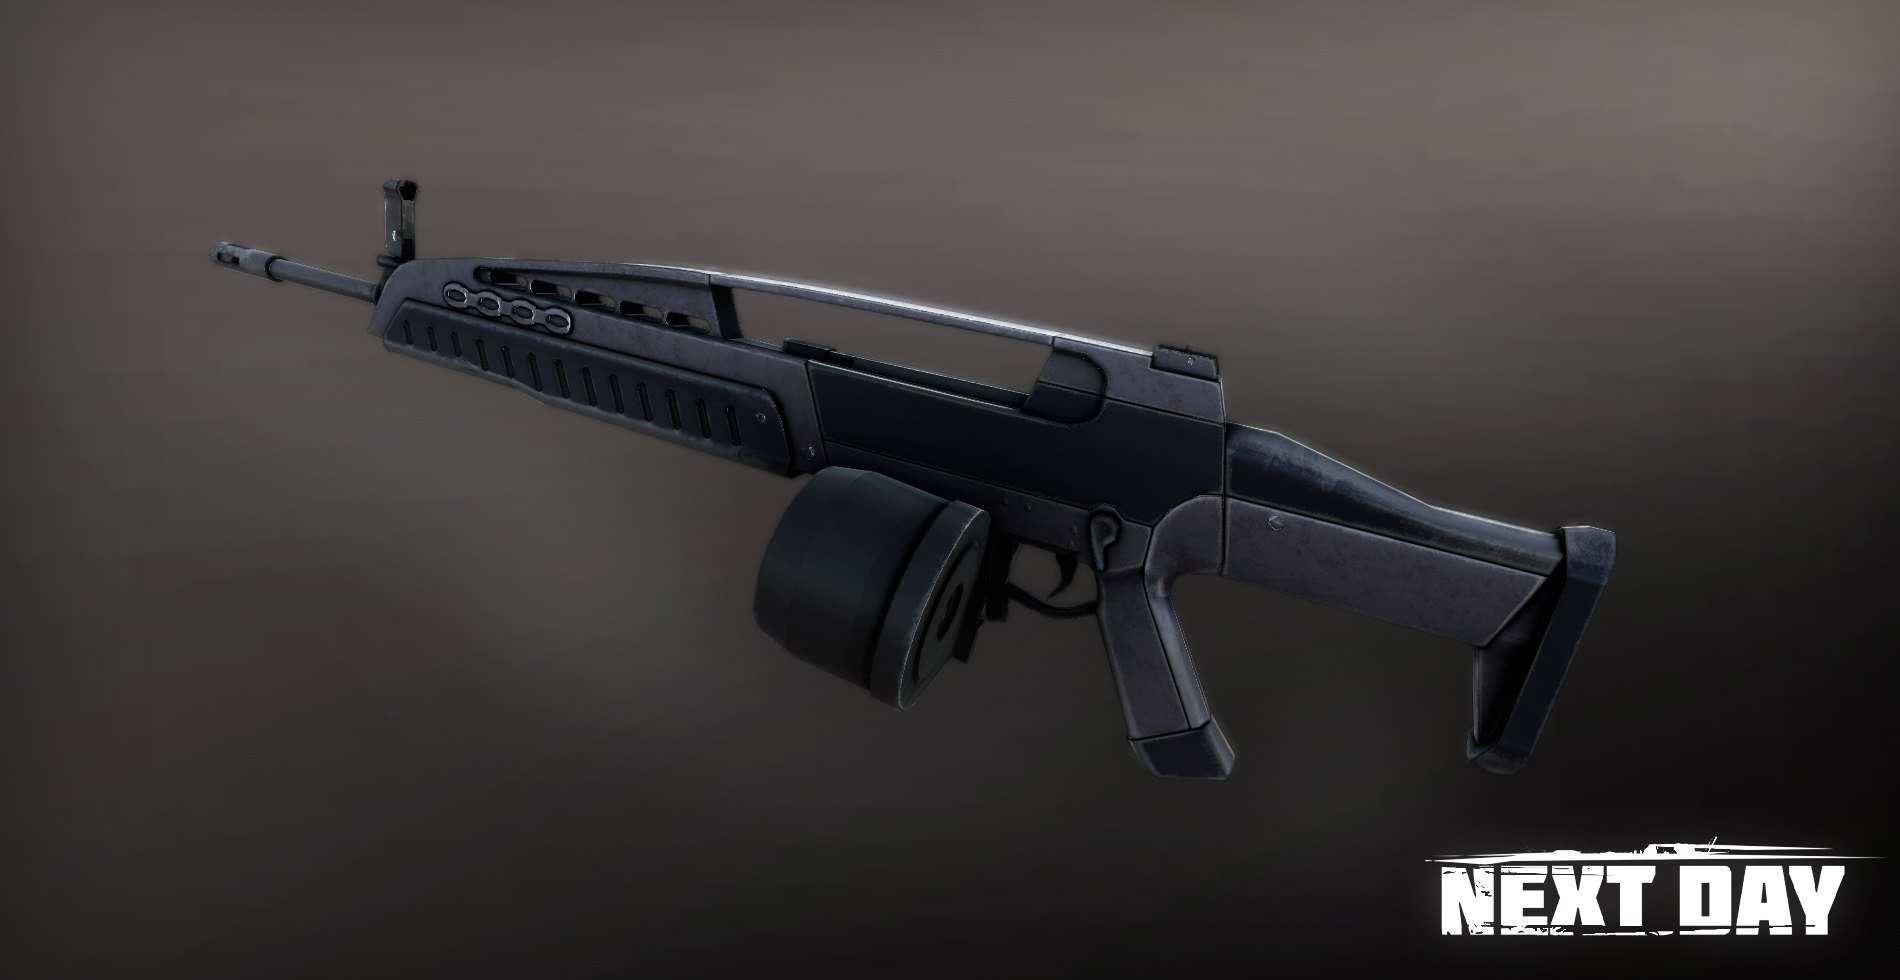 HK XM8 - Next Day: Survival Оружие